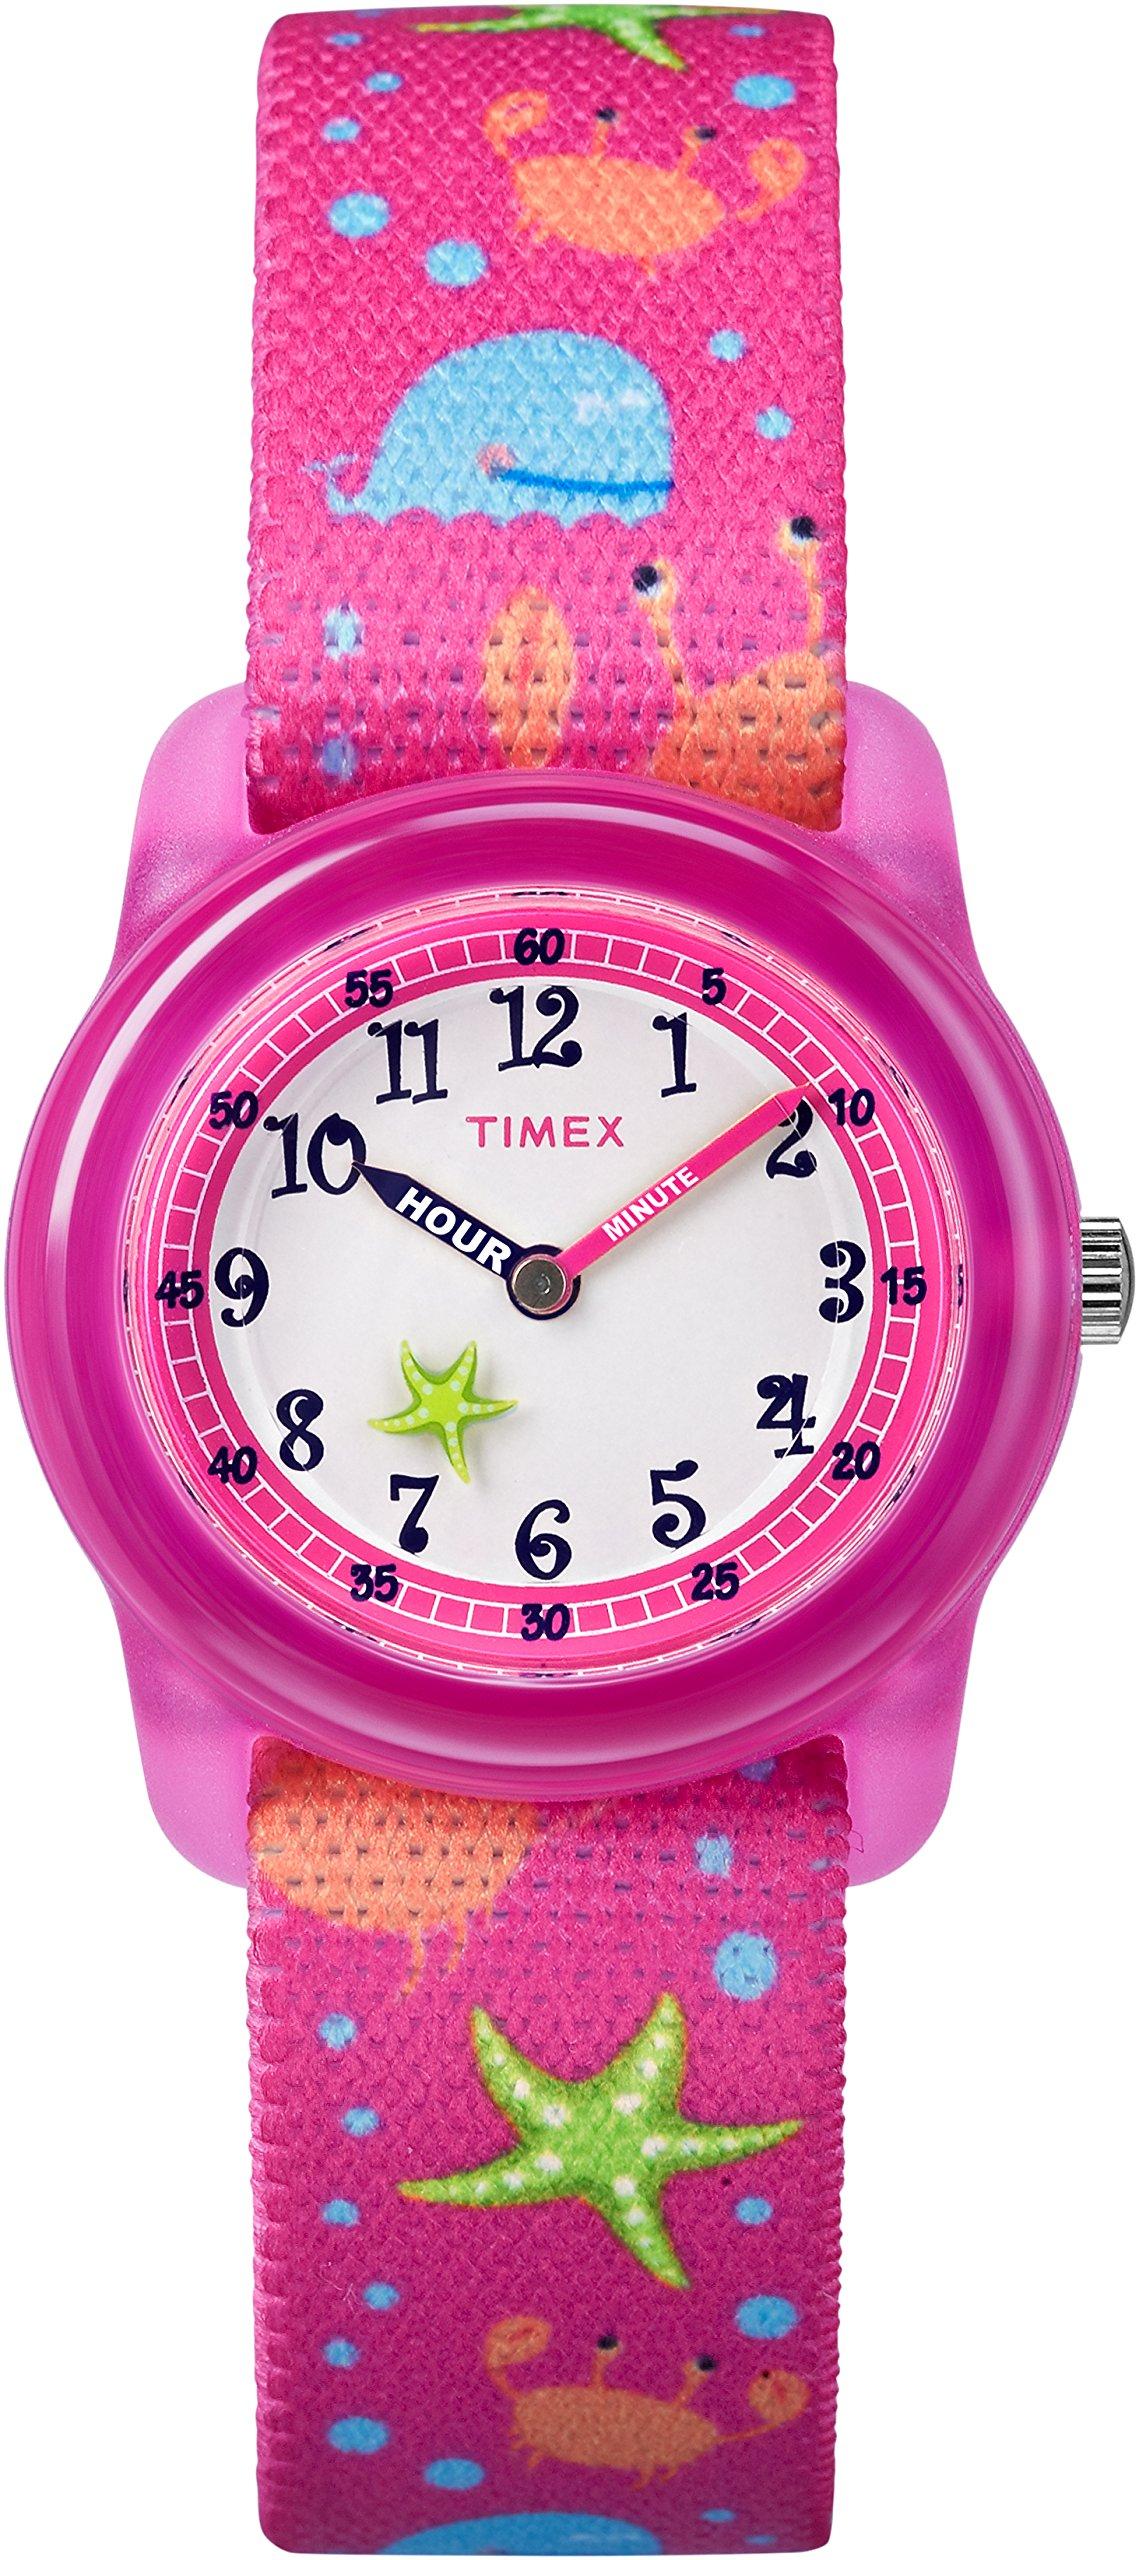 Timex Youth TW7C13600 Kid's Elastic Starfish Imprint Fabric Band Time Teacher Watch